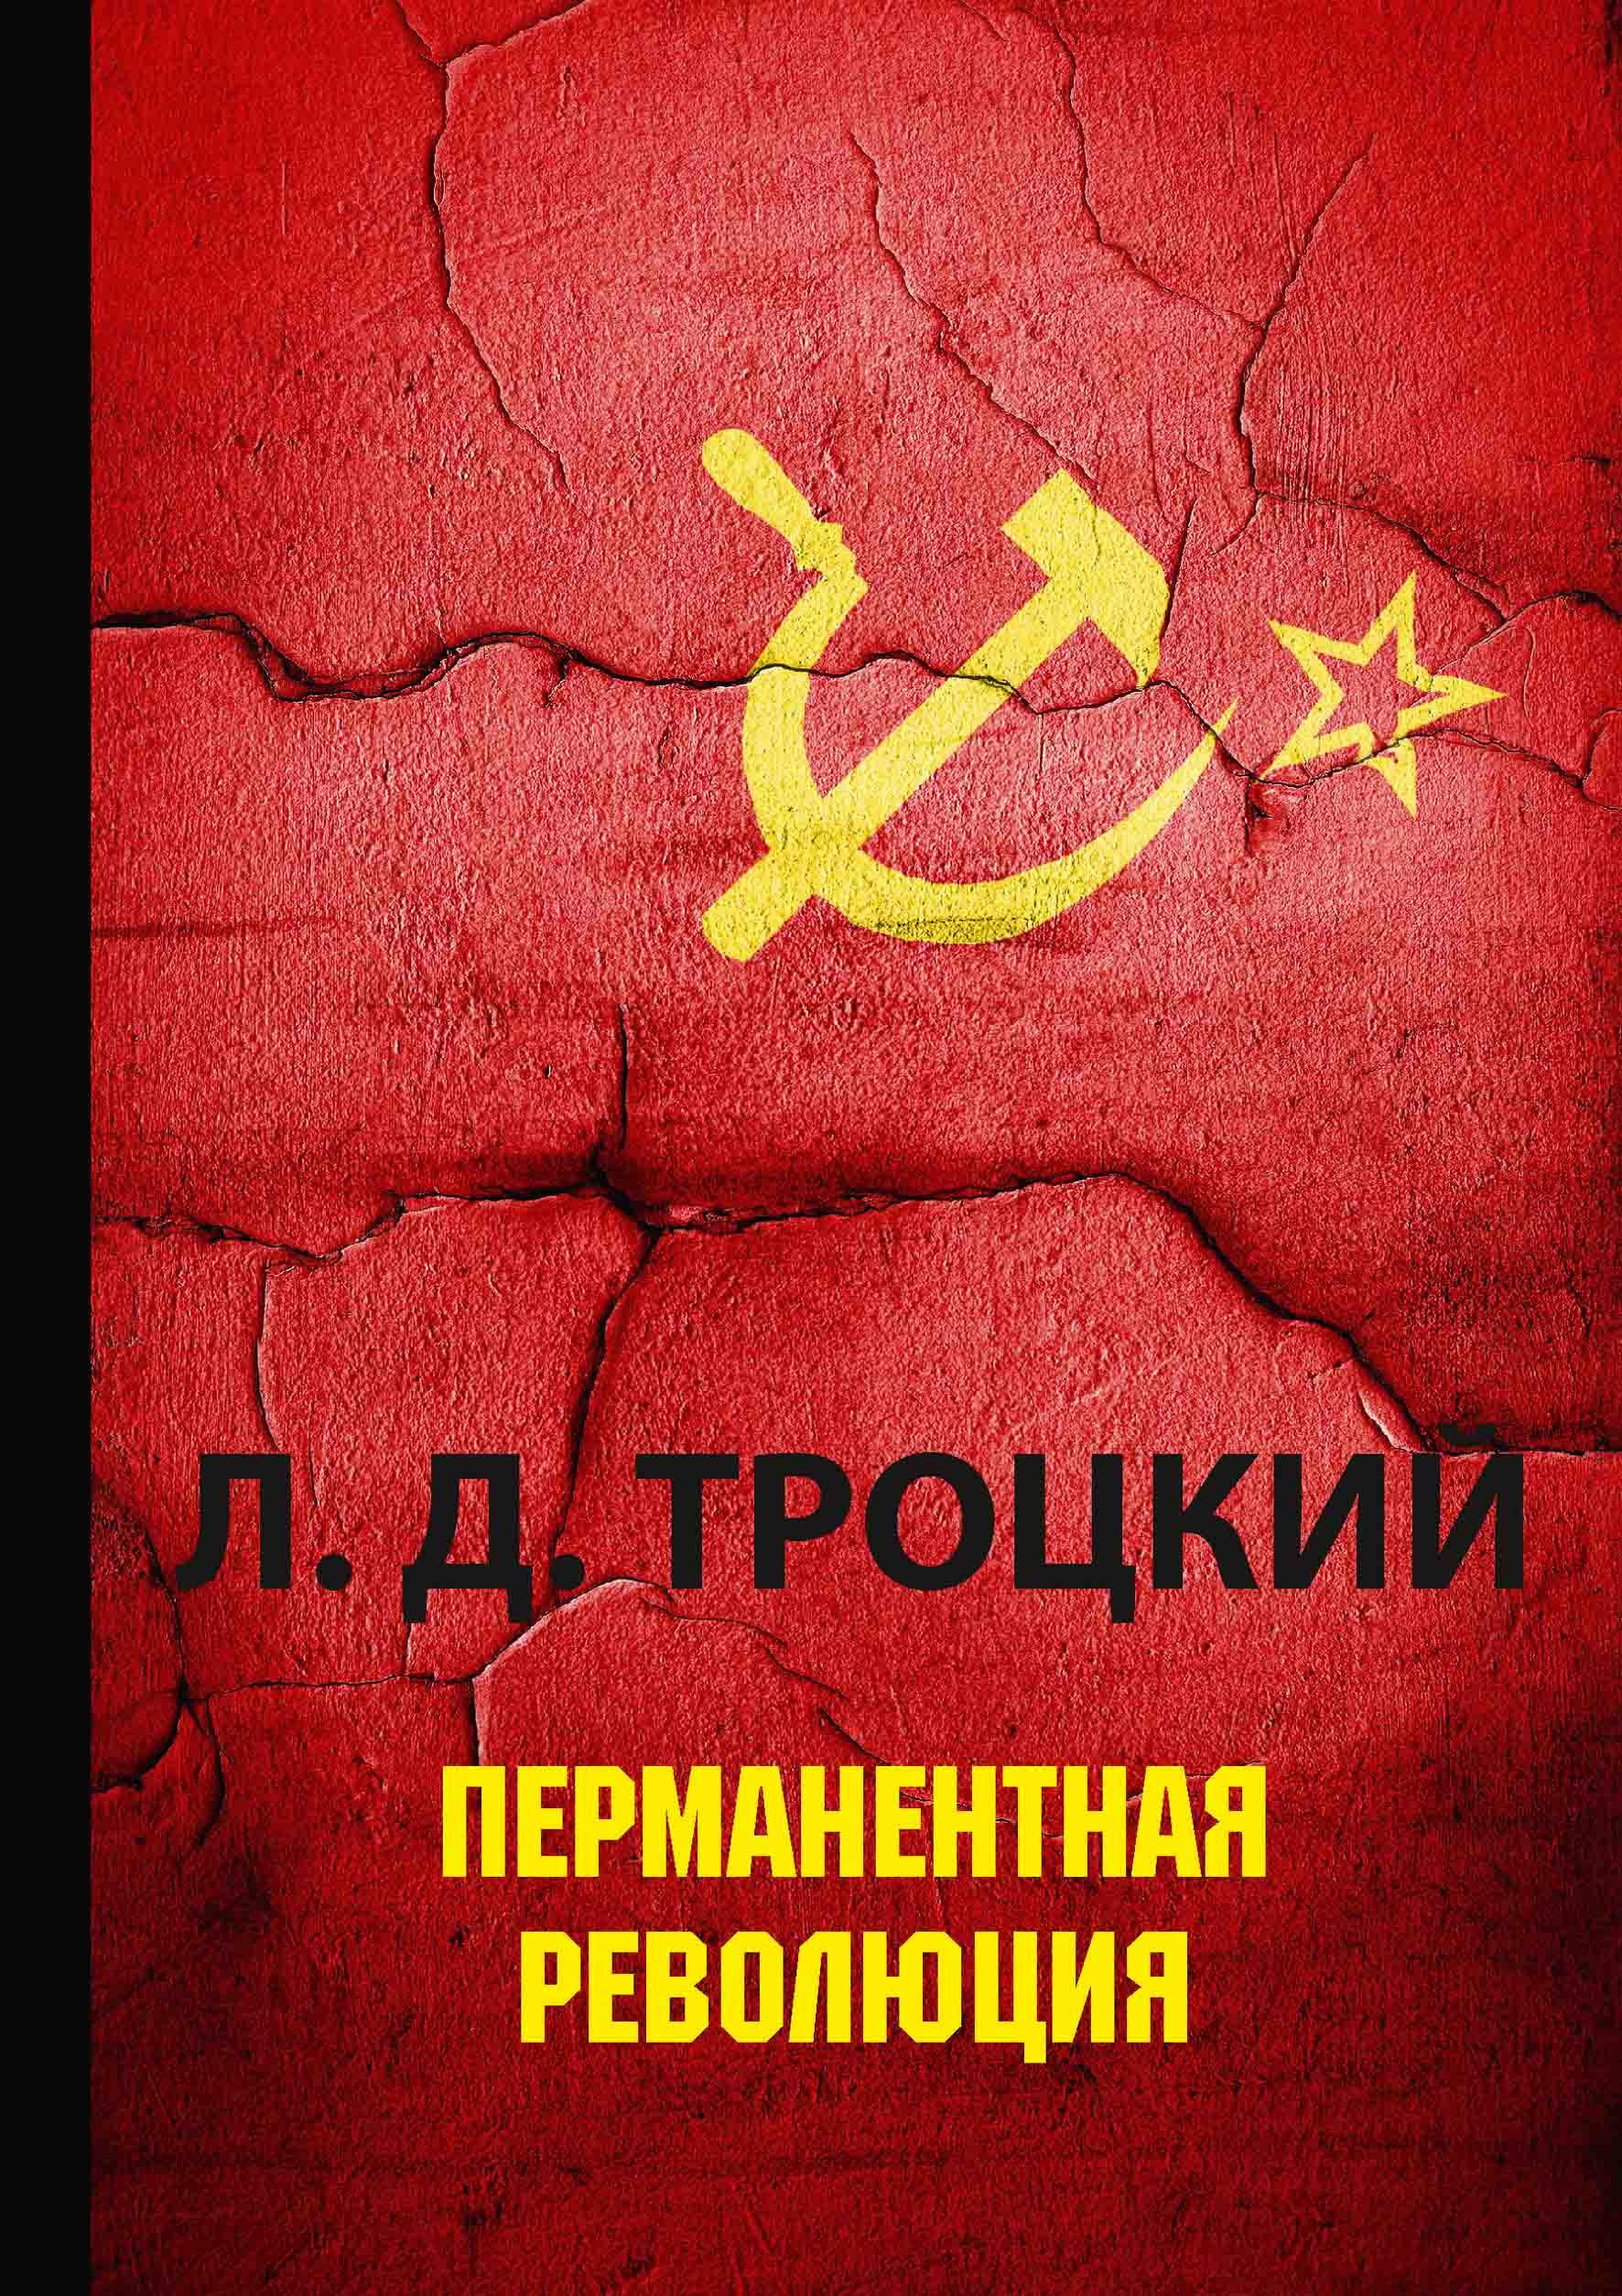 Л. Д. Троцкий Перманентная революция троцкий л наша первая революция часть ii